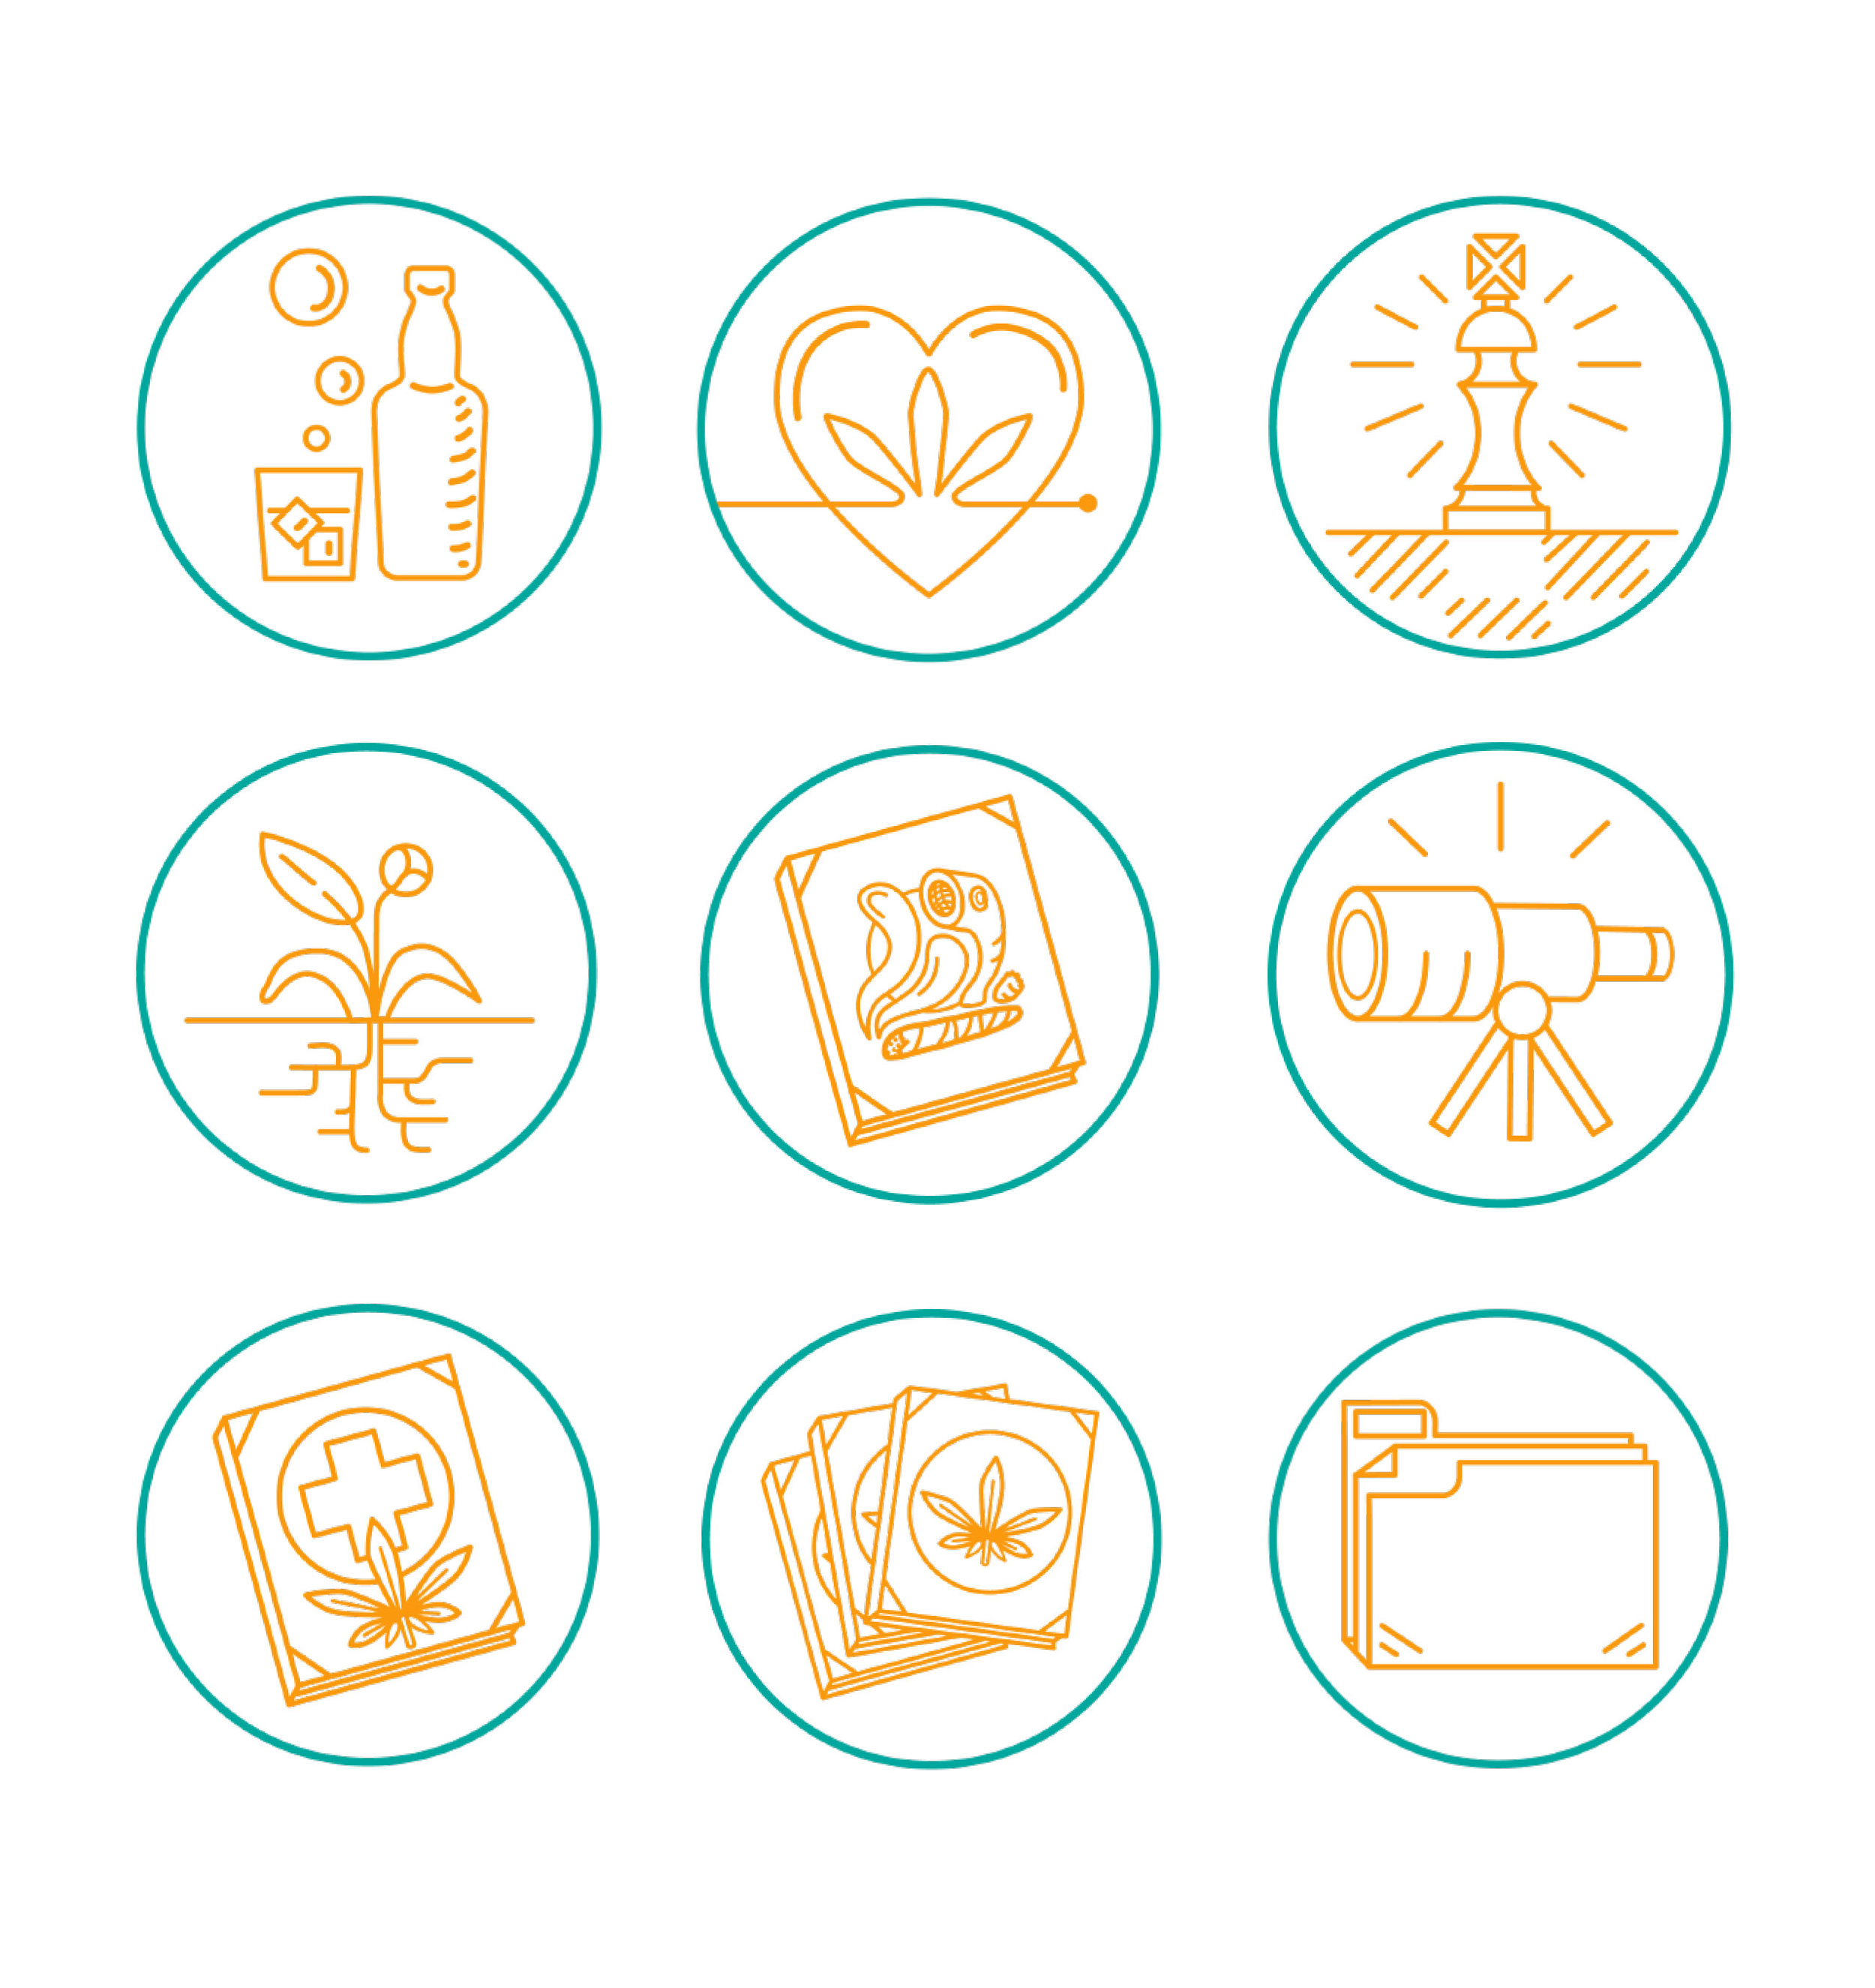 TaylorBaldry-Icons-Cannabis-1.jpg